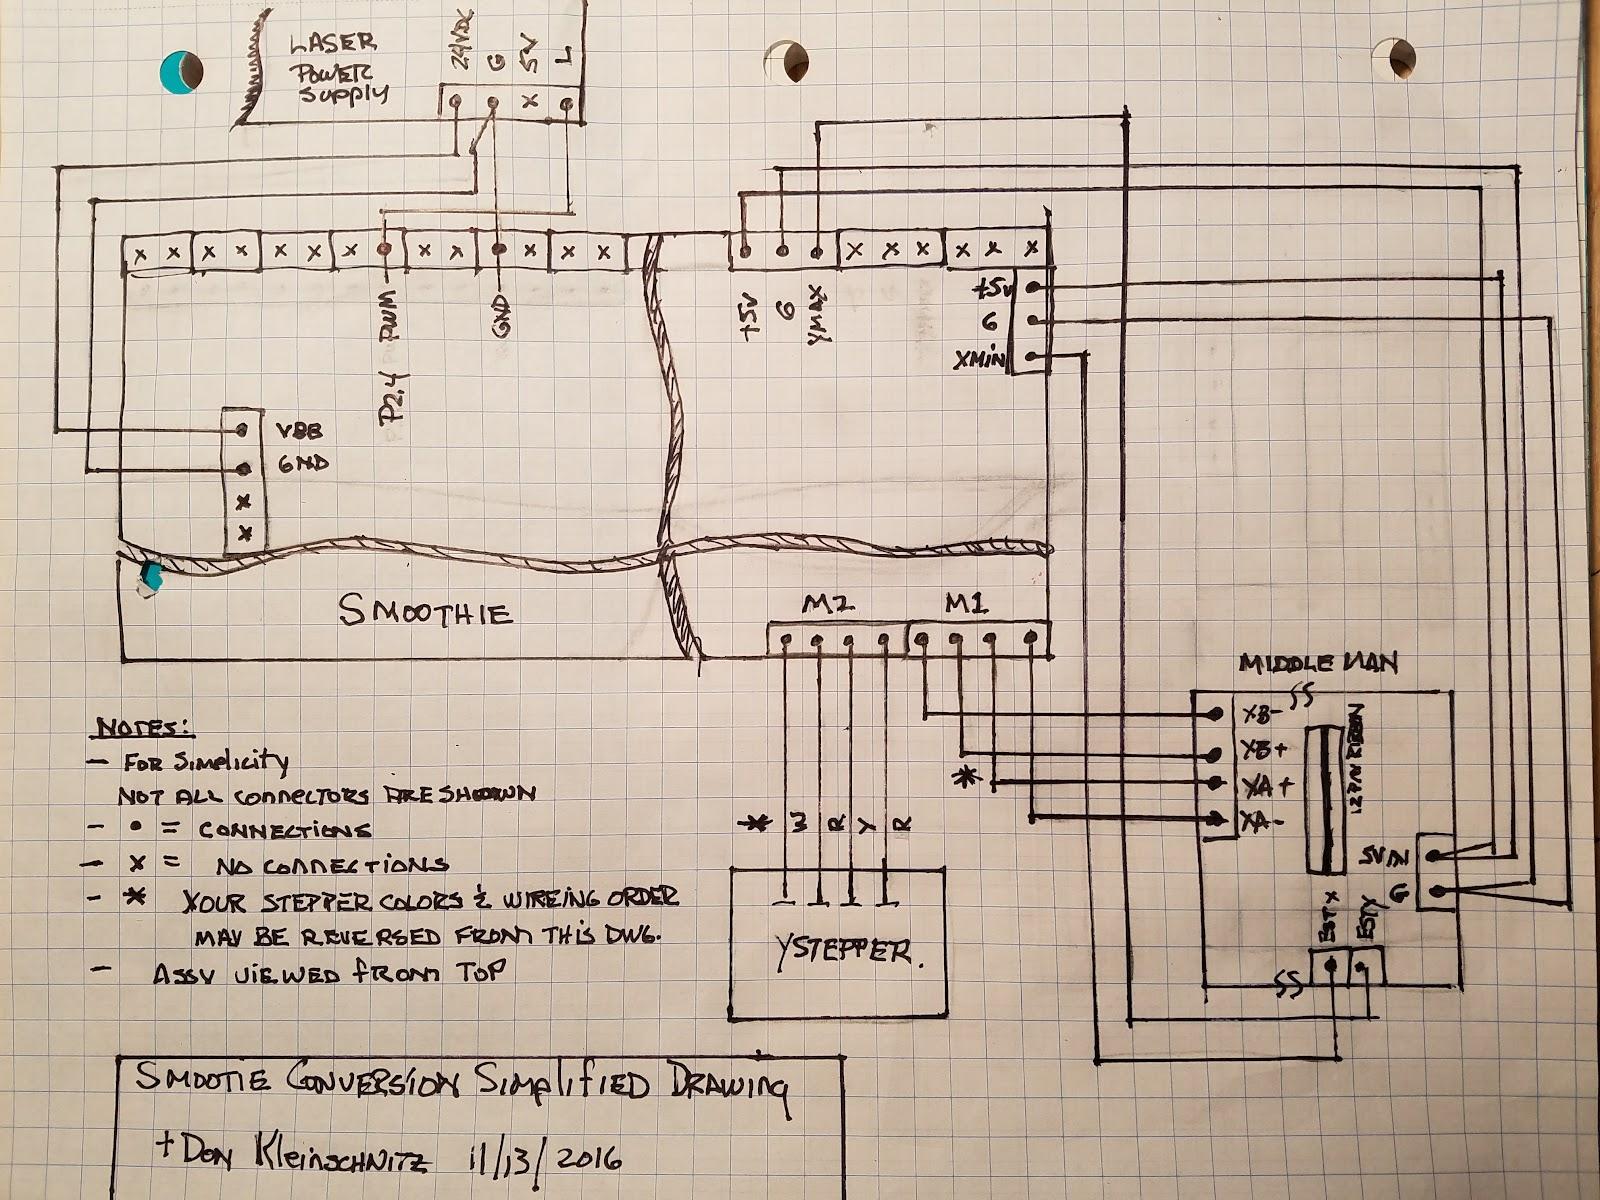 small resolution of k40 laser wiring diagram wiring diagram advancek40 laser wiring diagram